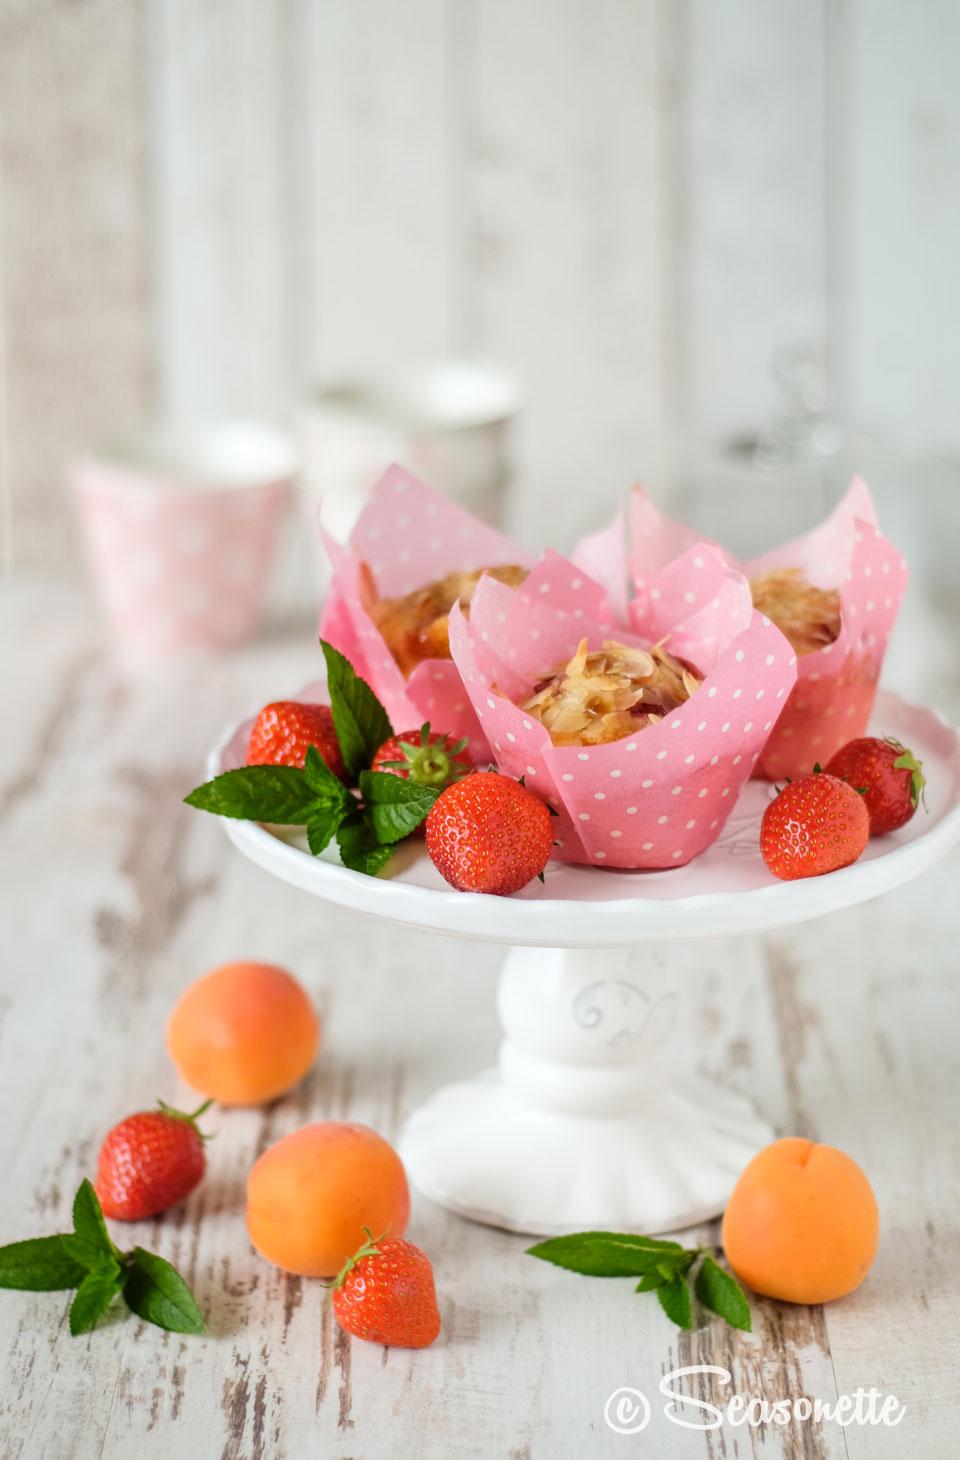 Erdbeer-Aprikosen-Muffins